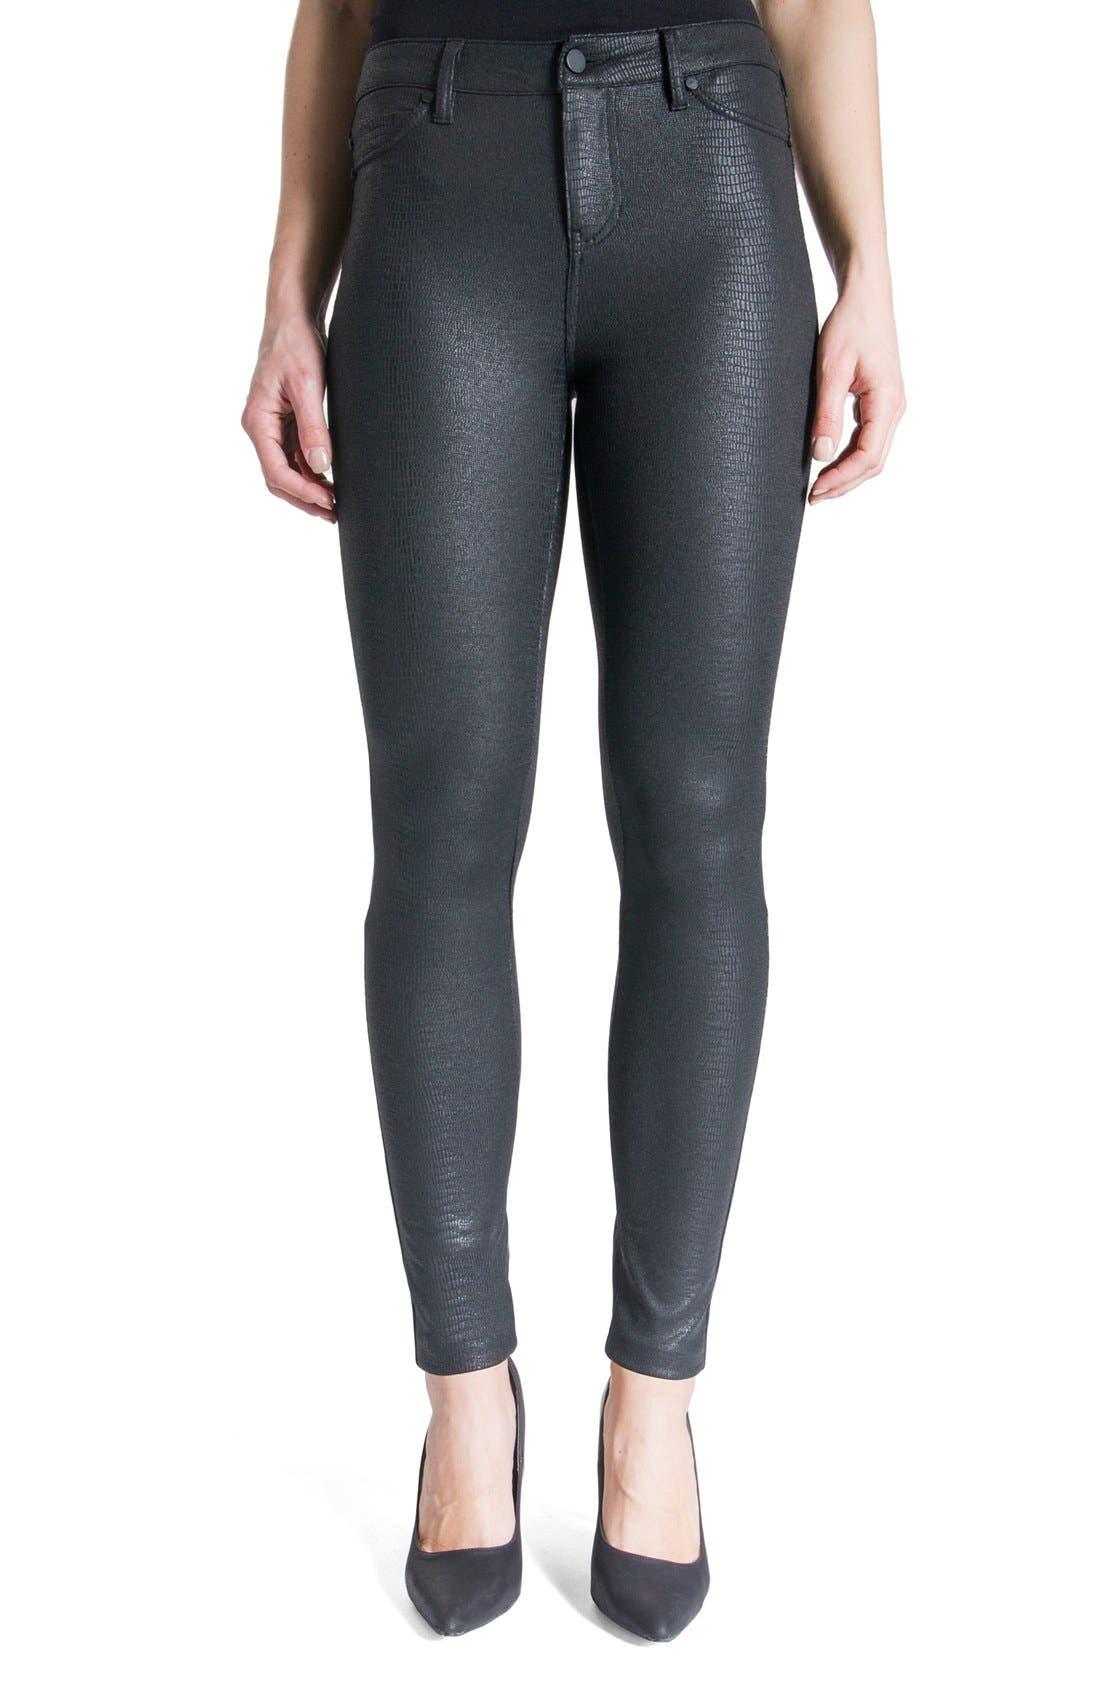 Liverpool Jeans Company 'Madonna' Leggings